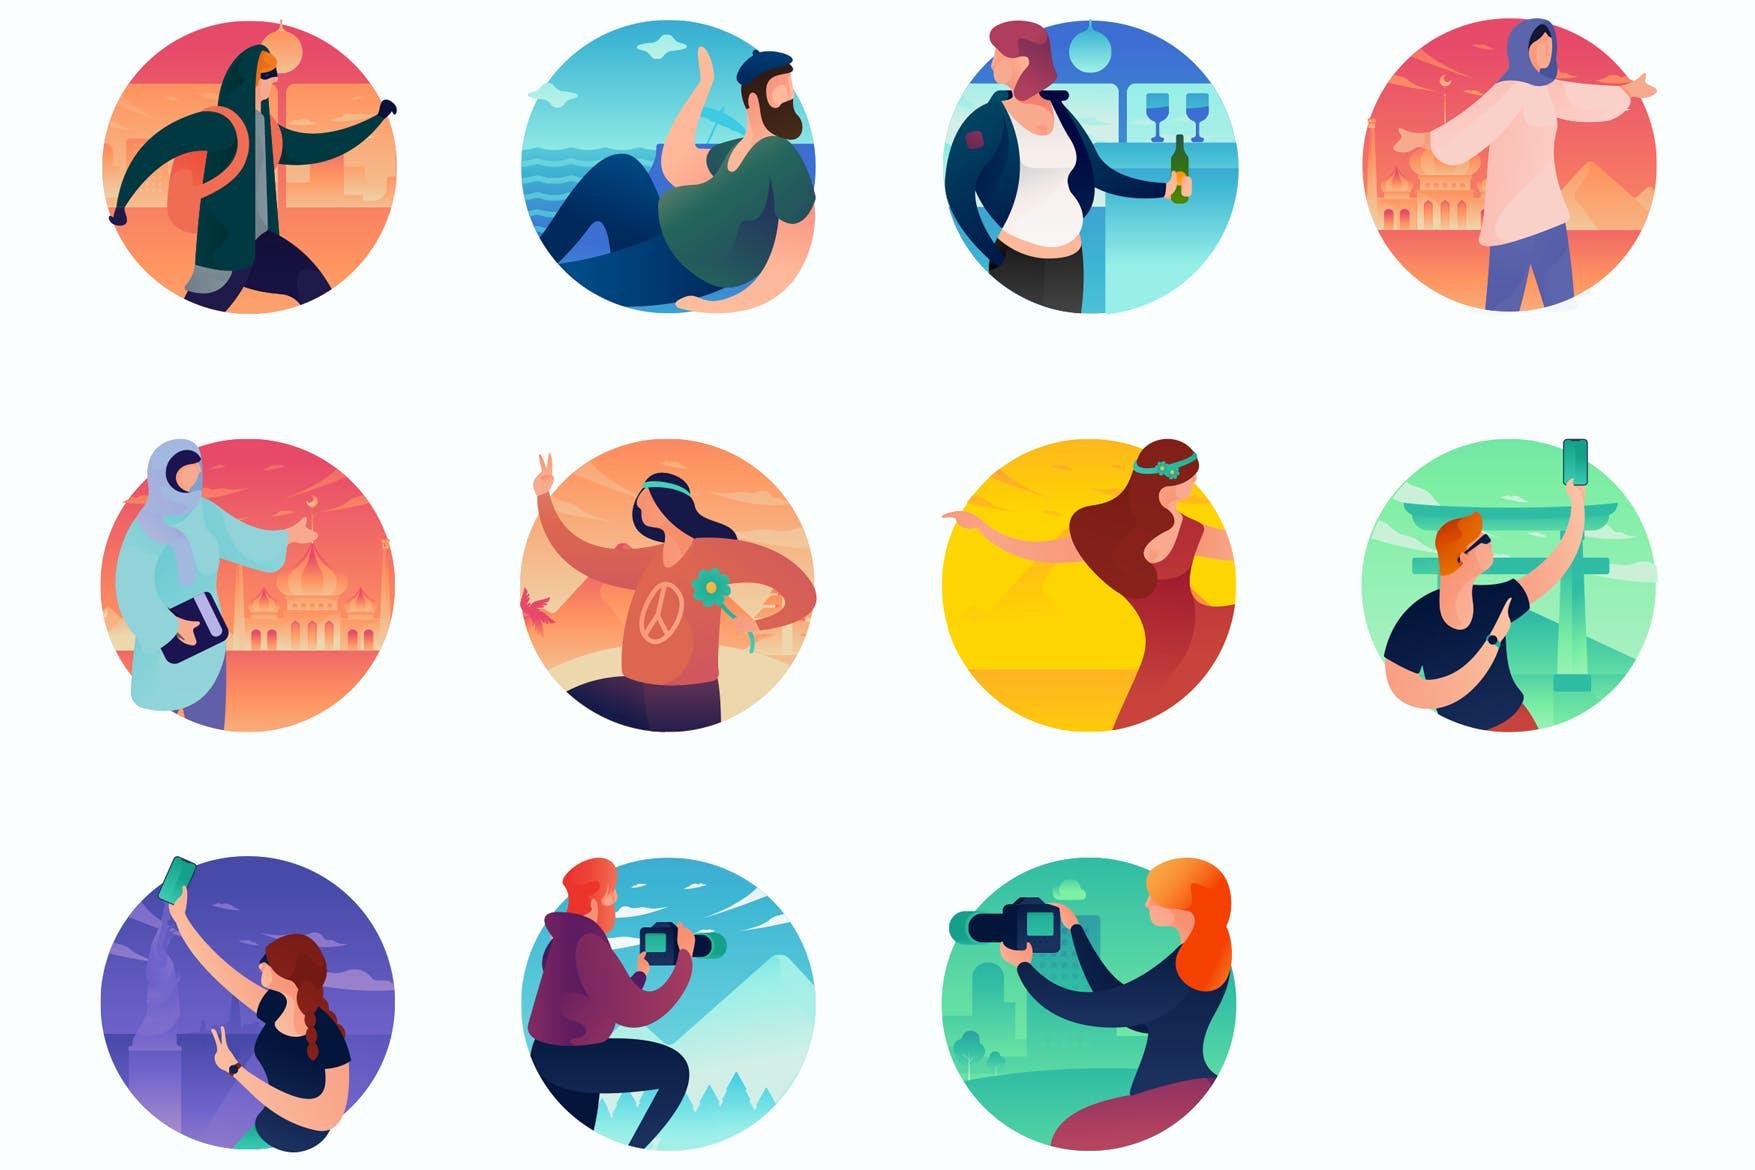 人物动态多场景插画素材下载Activities Curvy People Concept Illustrations